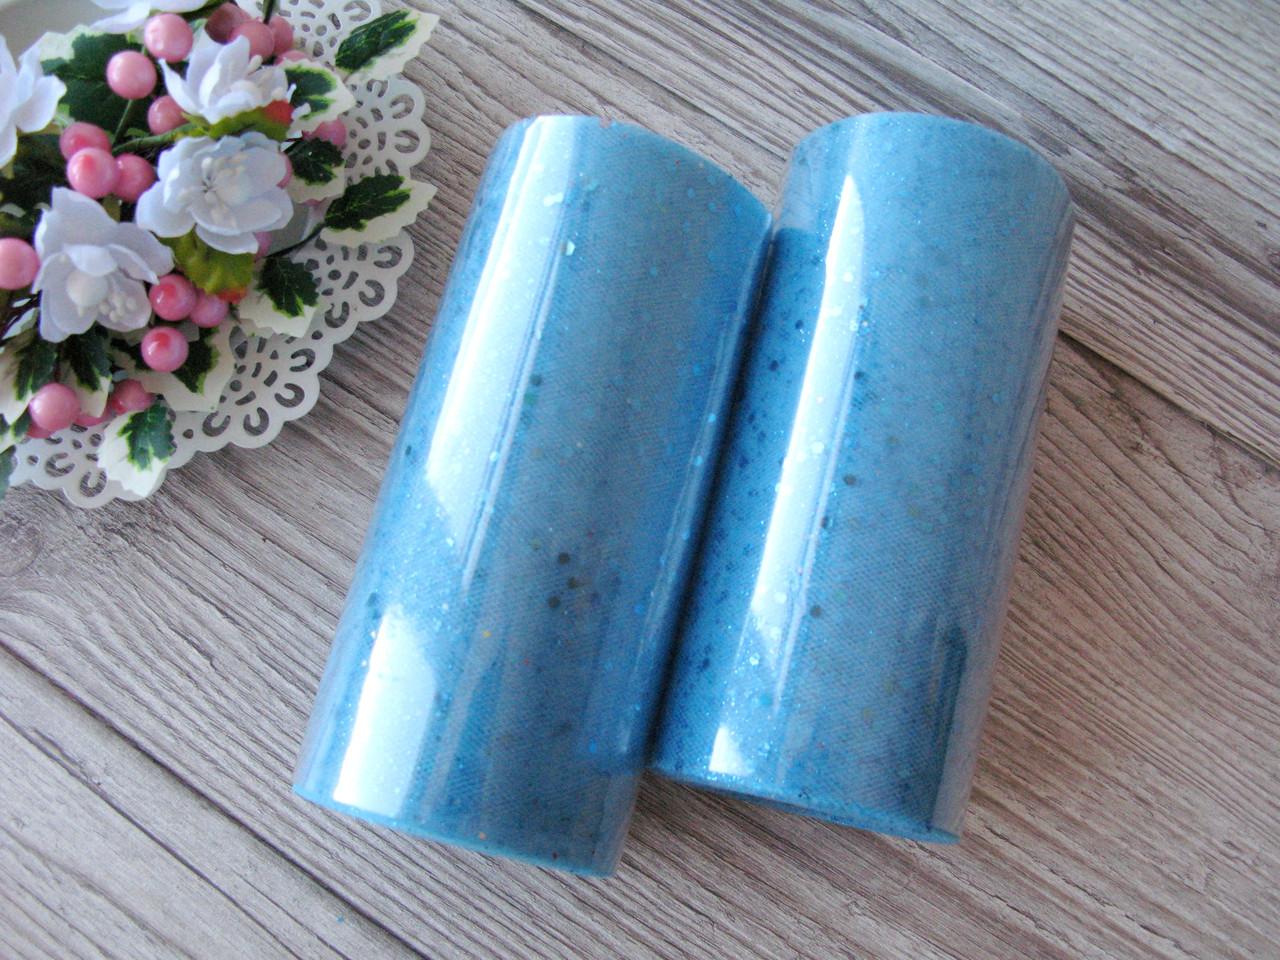 Фатин с мелкими блестками и пайеткой, голубой, бабина ширина 15 см длина 23 м - 105 грн.